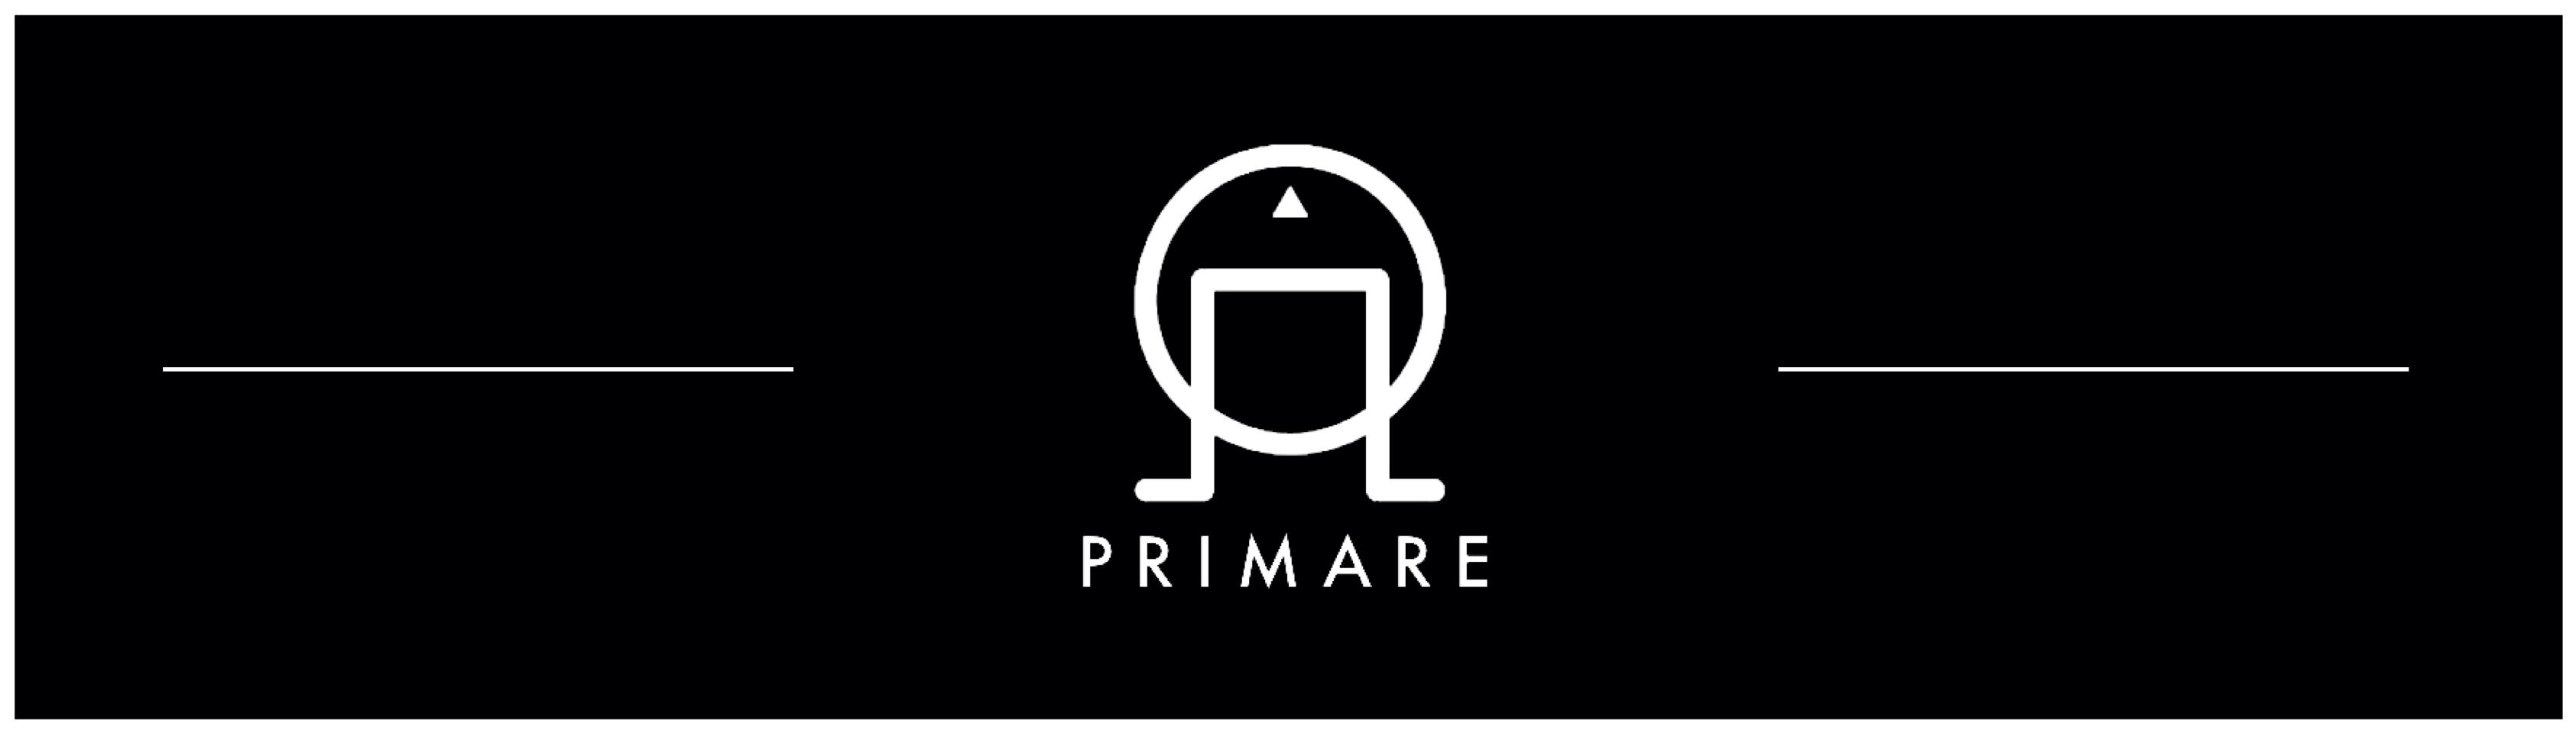 primare-logo.jpg